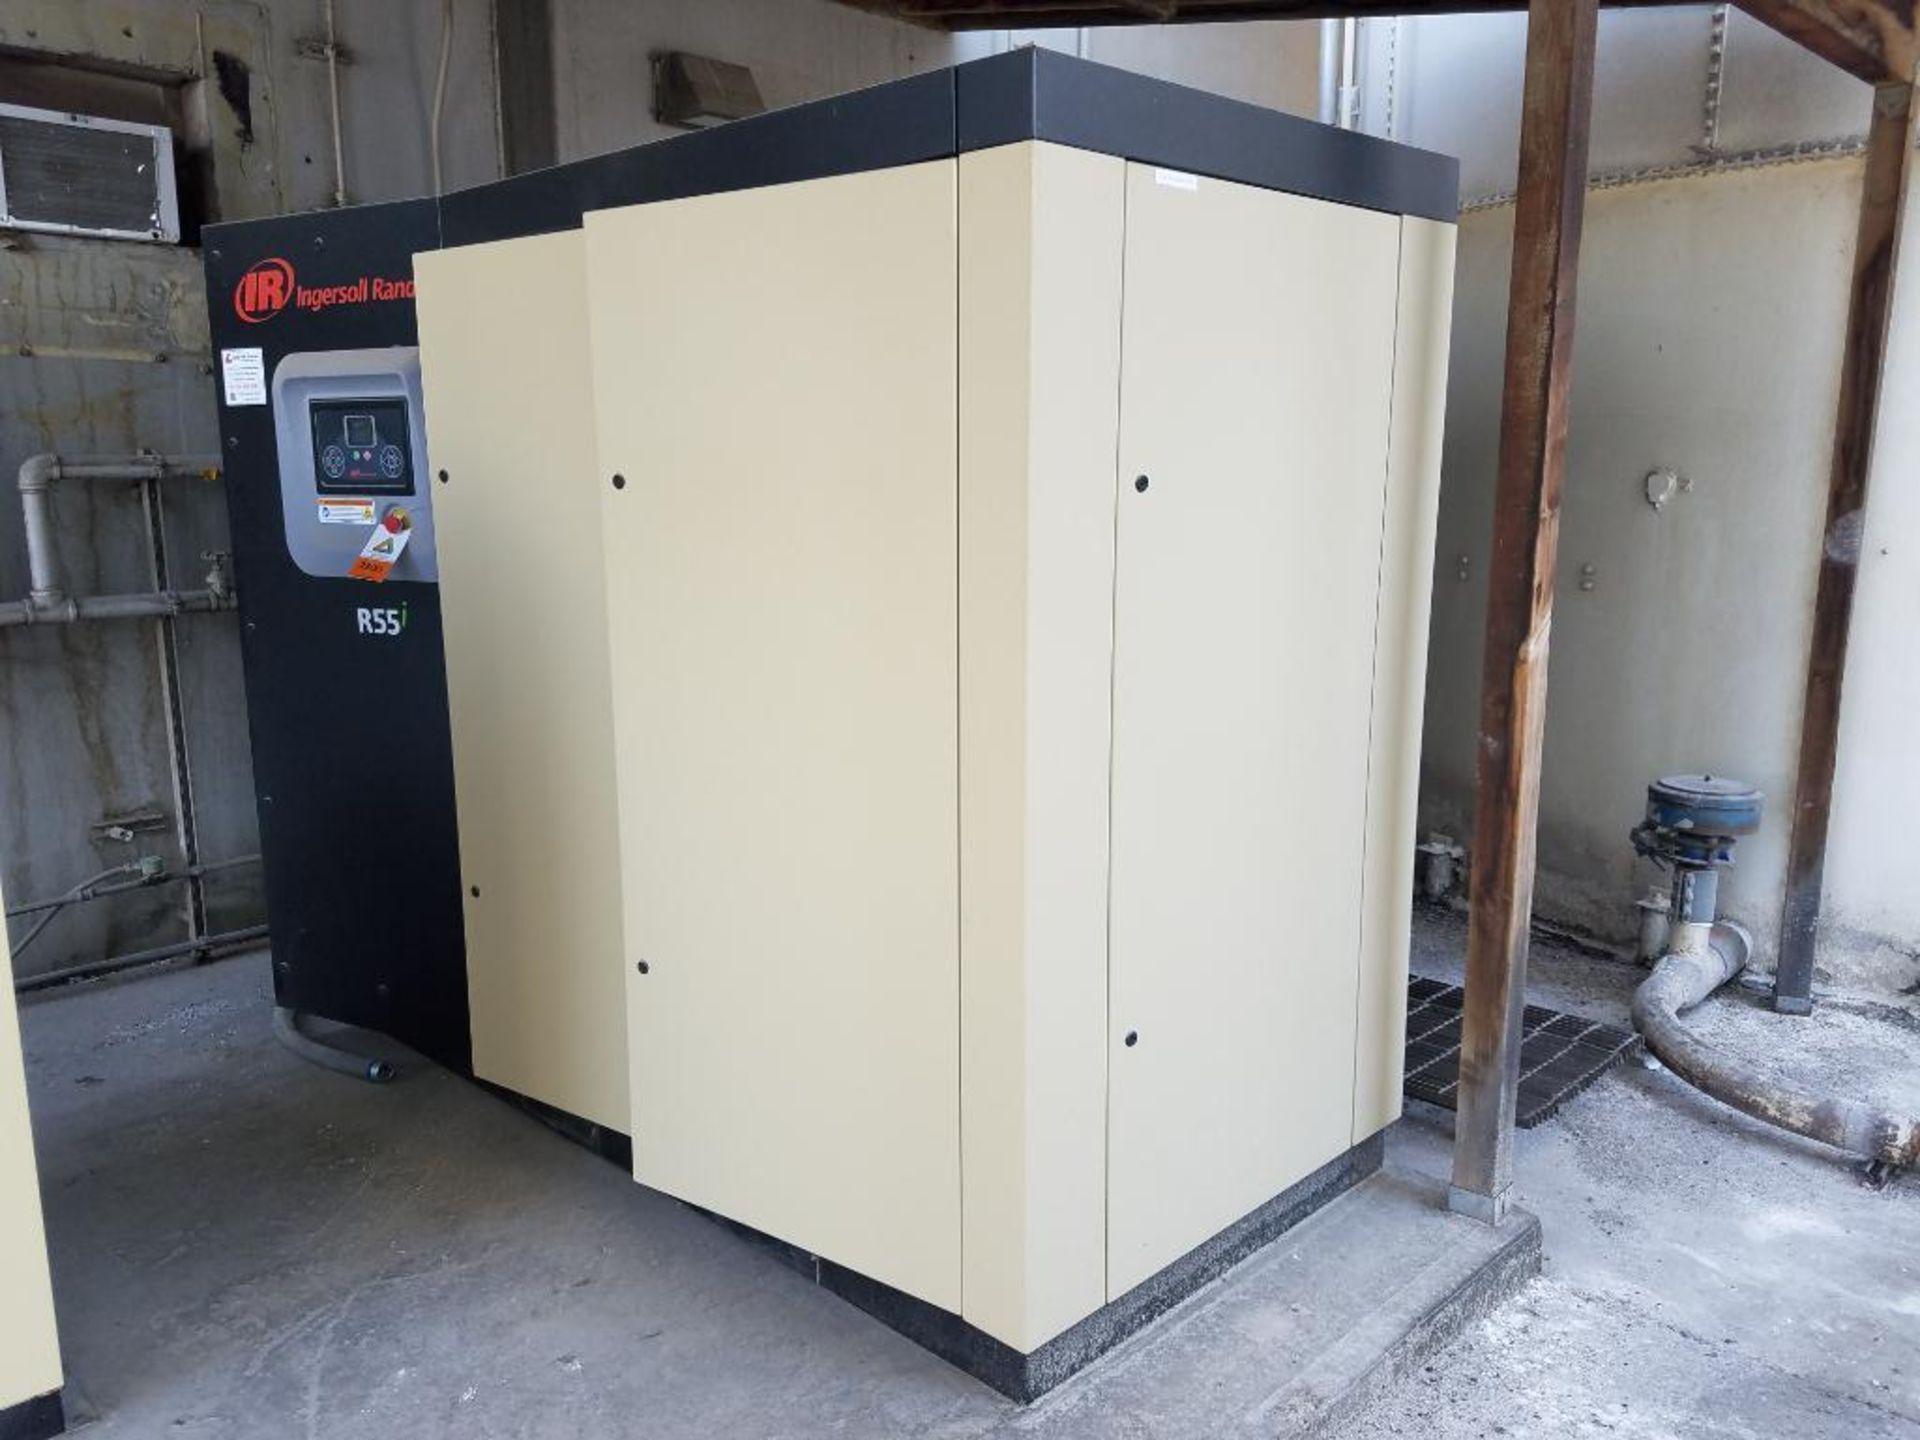 2018 Ingersoll Rand rotary screw air compressor